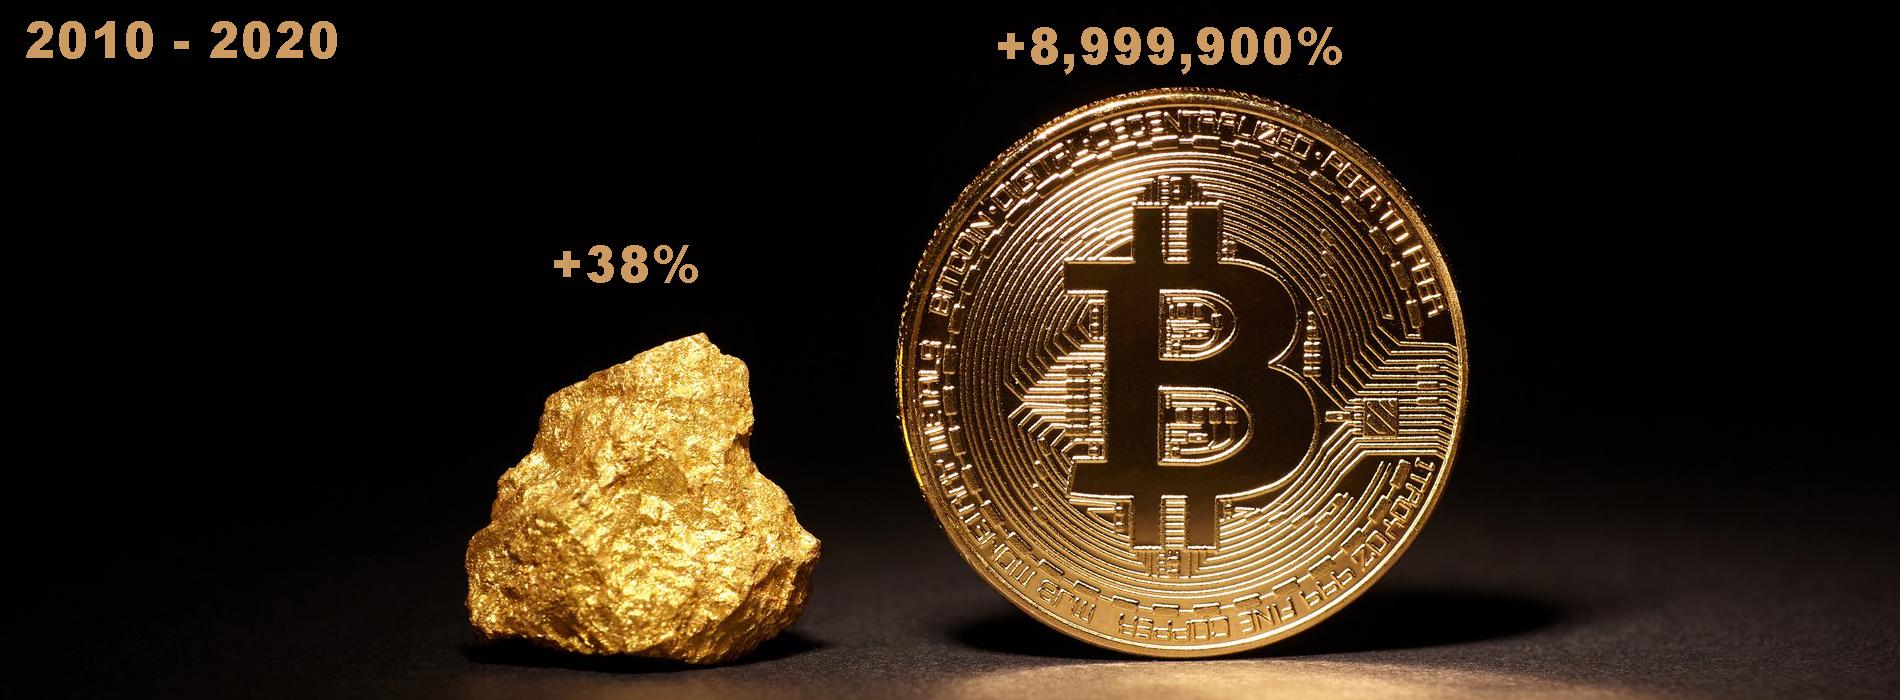 "Bitcoin ganó 8.9 millones por ciento durante la última década ""ancho ="" 1900 ""altura ="" 700 ""srcset ="" https://blackswanfinances.com/wp-content/uploads/2019/12/btcgold.jpg 1900w, https://news.bitcoin.com/wp-content/uploads/2019/12/ btcgold-300x111.jpg 300w, https://news.bitcoin.com/wp-content/uploads/2019/12/btcgold-1024x377.jpg 1024w, https://news.bitcoin.com/wp-content/uploads/ 2019/12 / btcgold-768x283.jpg 768w, https://news.bitcoin.com/wp-content/uploads/2019/12/btcgold-1536x566.jpg 1536w, https://news.bitcoin.com/wp- content / uploads / 2019/12 / btcgold-696x256.jpg 696w, https://news.bitcoin.com/wp-content/uploads/2019/12/btcgold-1392x513.jpg 1392w, https: //news.bitcoin. com / wp-content / uploads / 2019/12 / btcgold-1068x393.jpg 1068w, https://news.bitcoin.com/wp-content/uploads/2019/12/btcgold-1140x420.jpg 1140w ""tamaños ="" ( ancho máx .: 1900px) 100vw, 1900px"